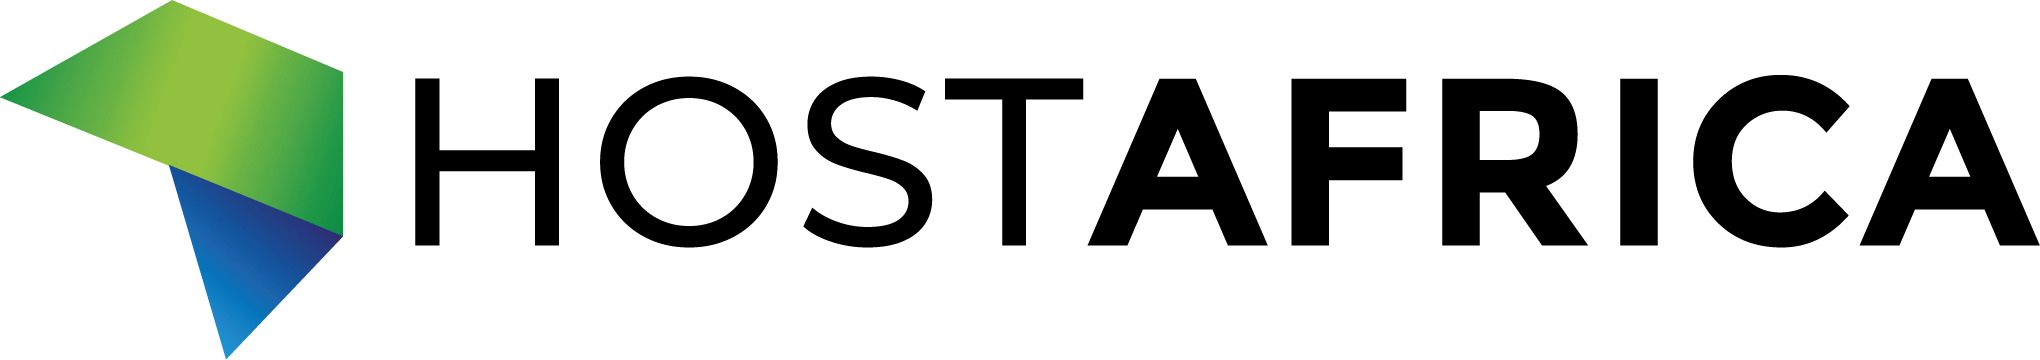 hostafrica-logo